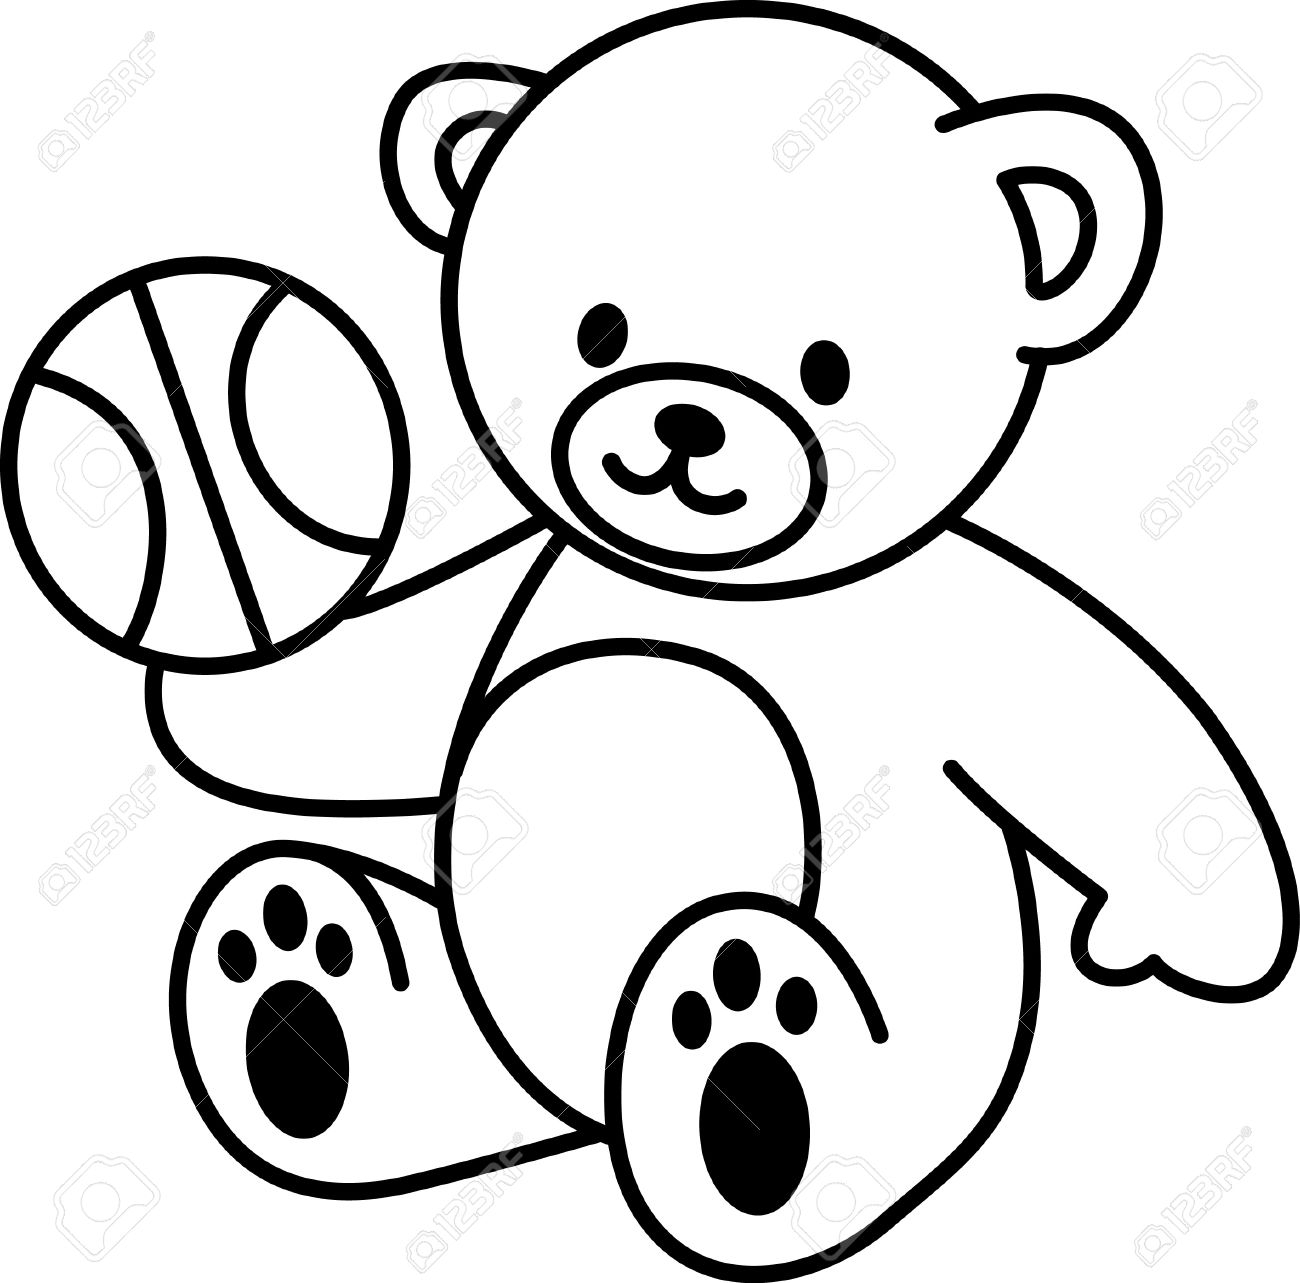 1300x1283 Drawn Teddy Bear Gangster Free Clip Art Stock Illustrations